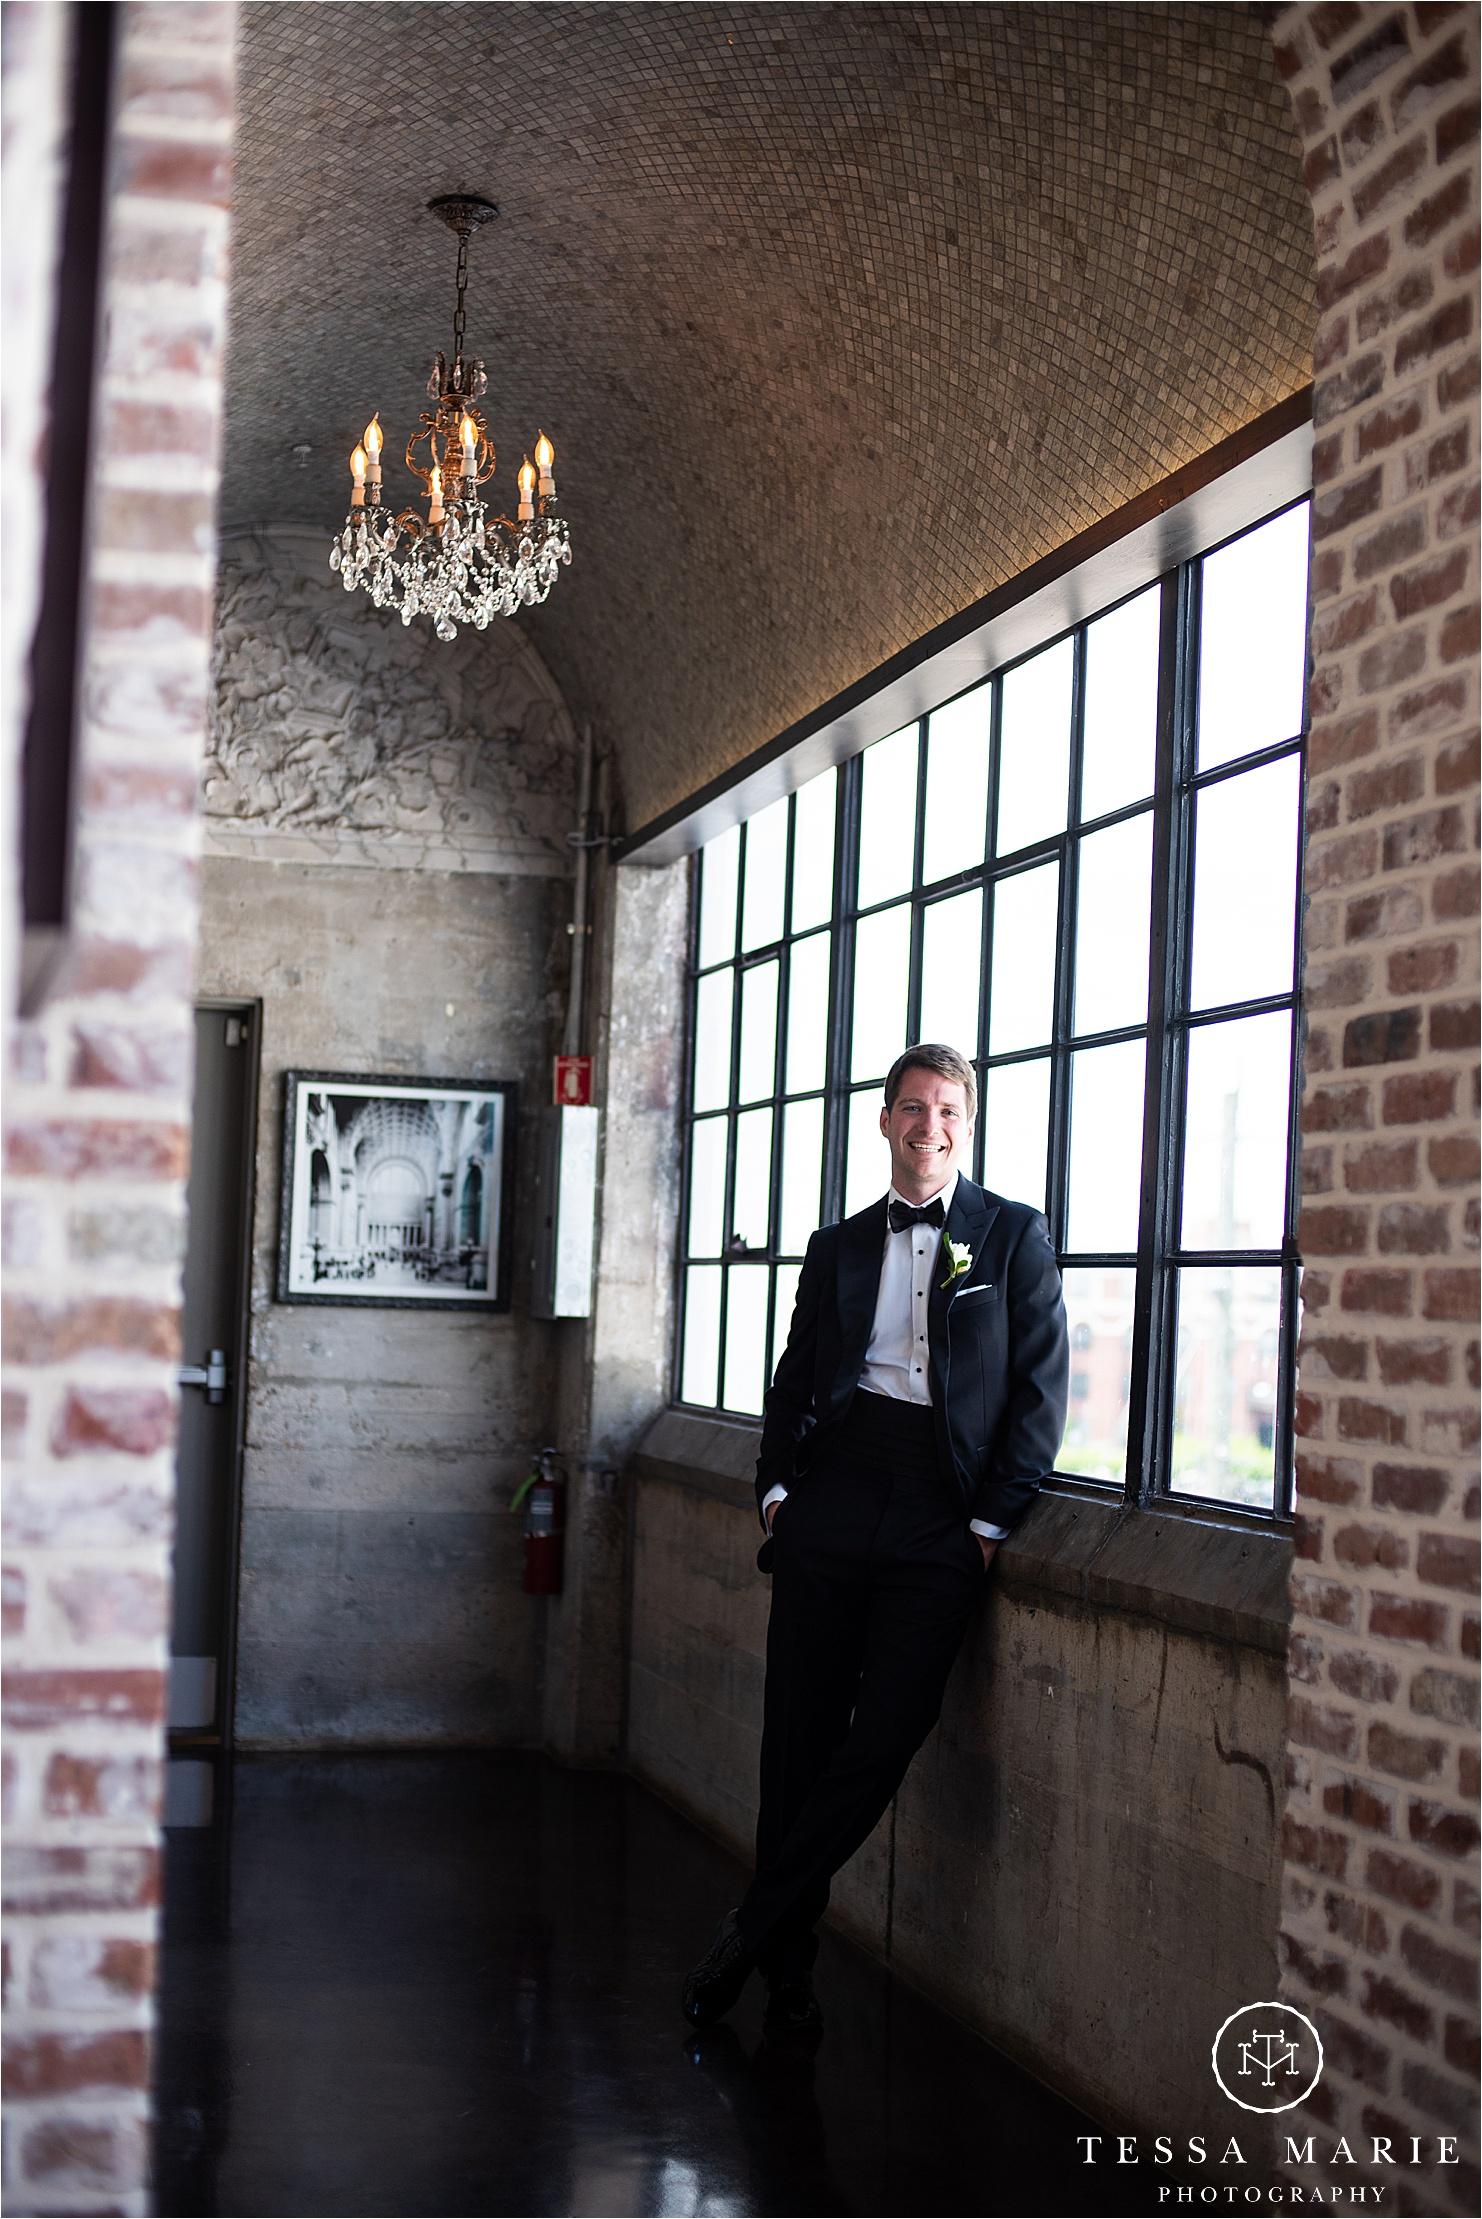 Tessa_marie_weddings_houston_wedding_photographer_The_astorian_0070.jpg